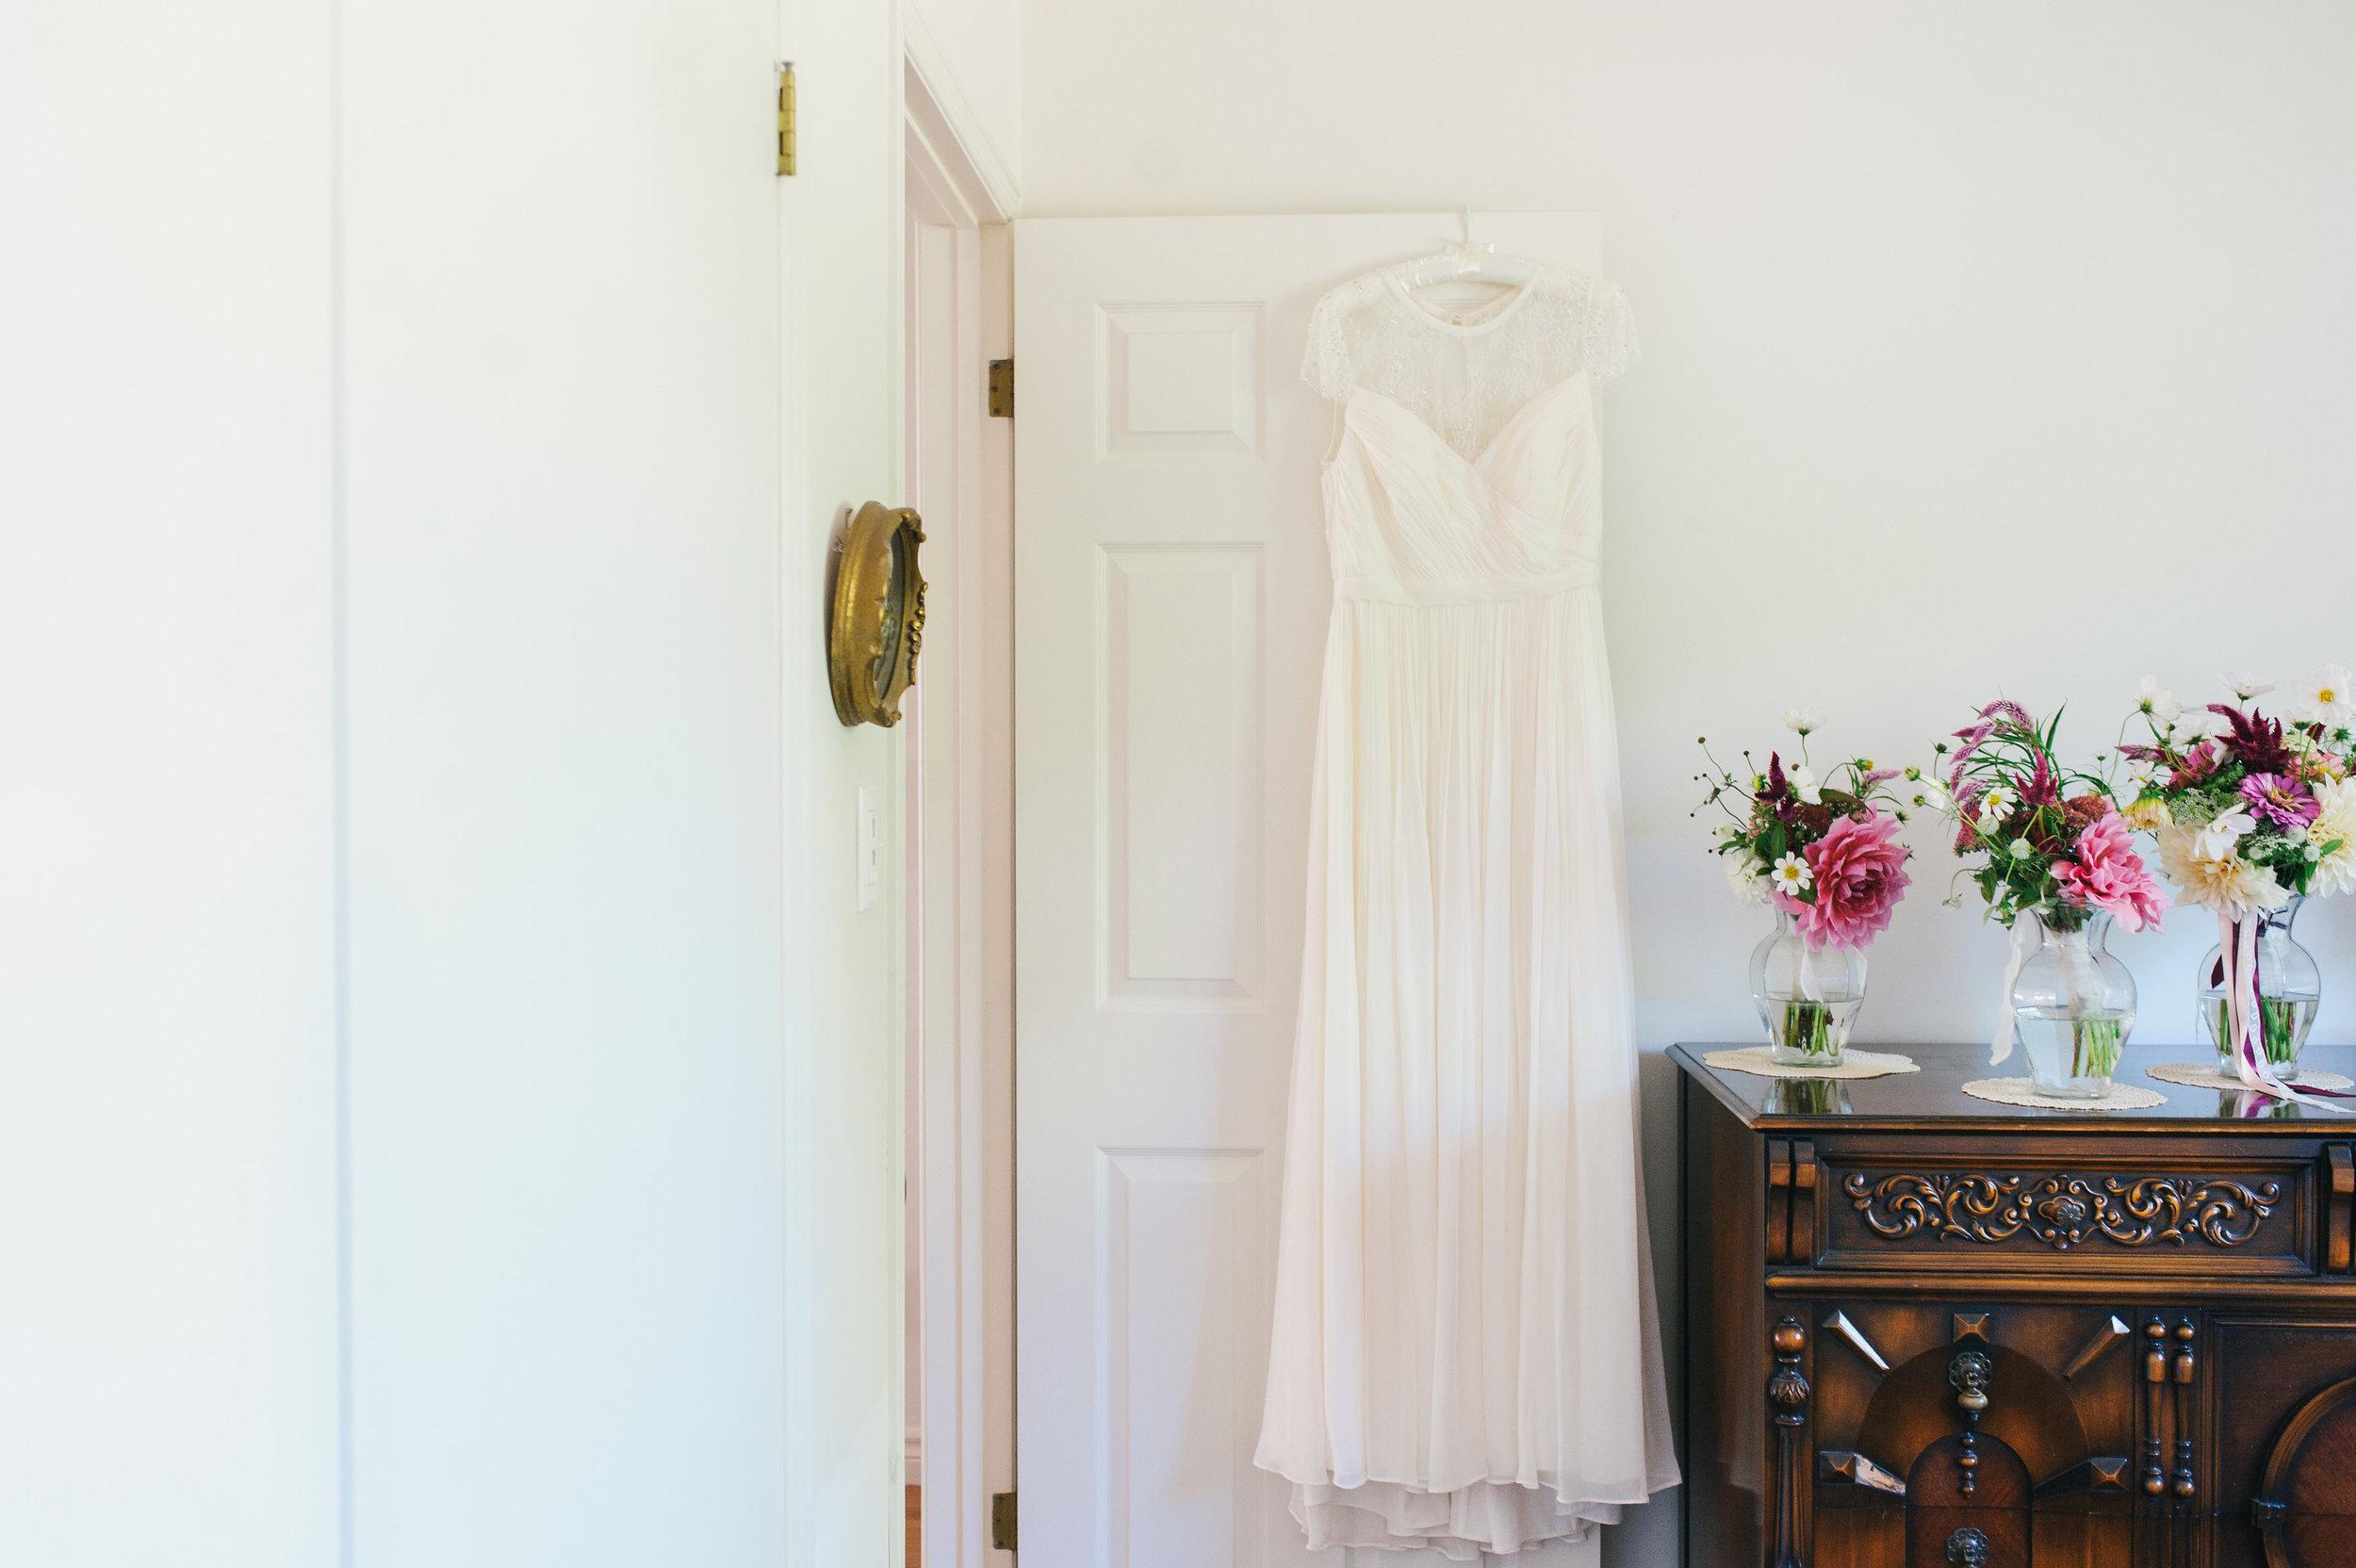 marial-daniel-wedding-balls-falls-sara-wilde-photography-0026.jpg